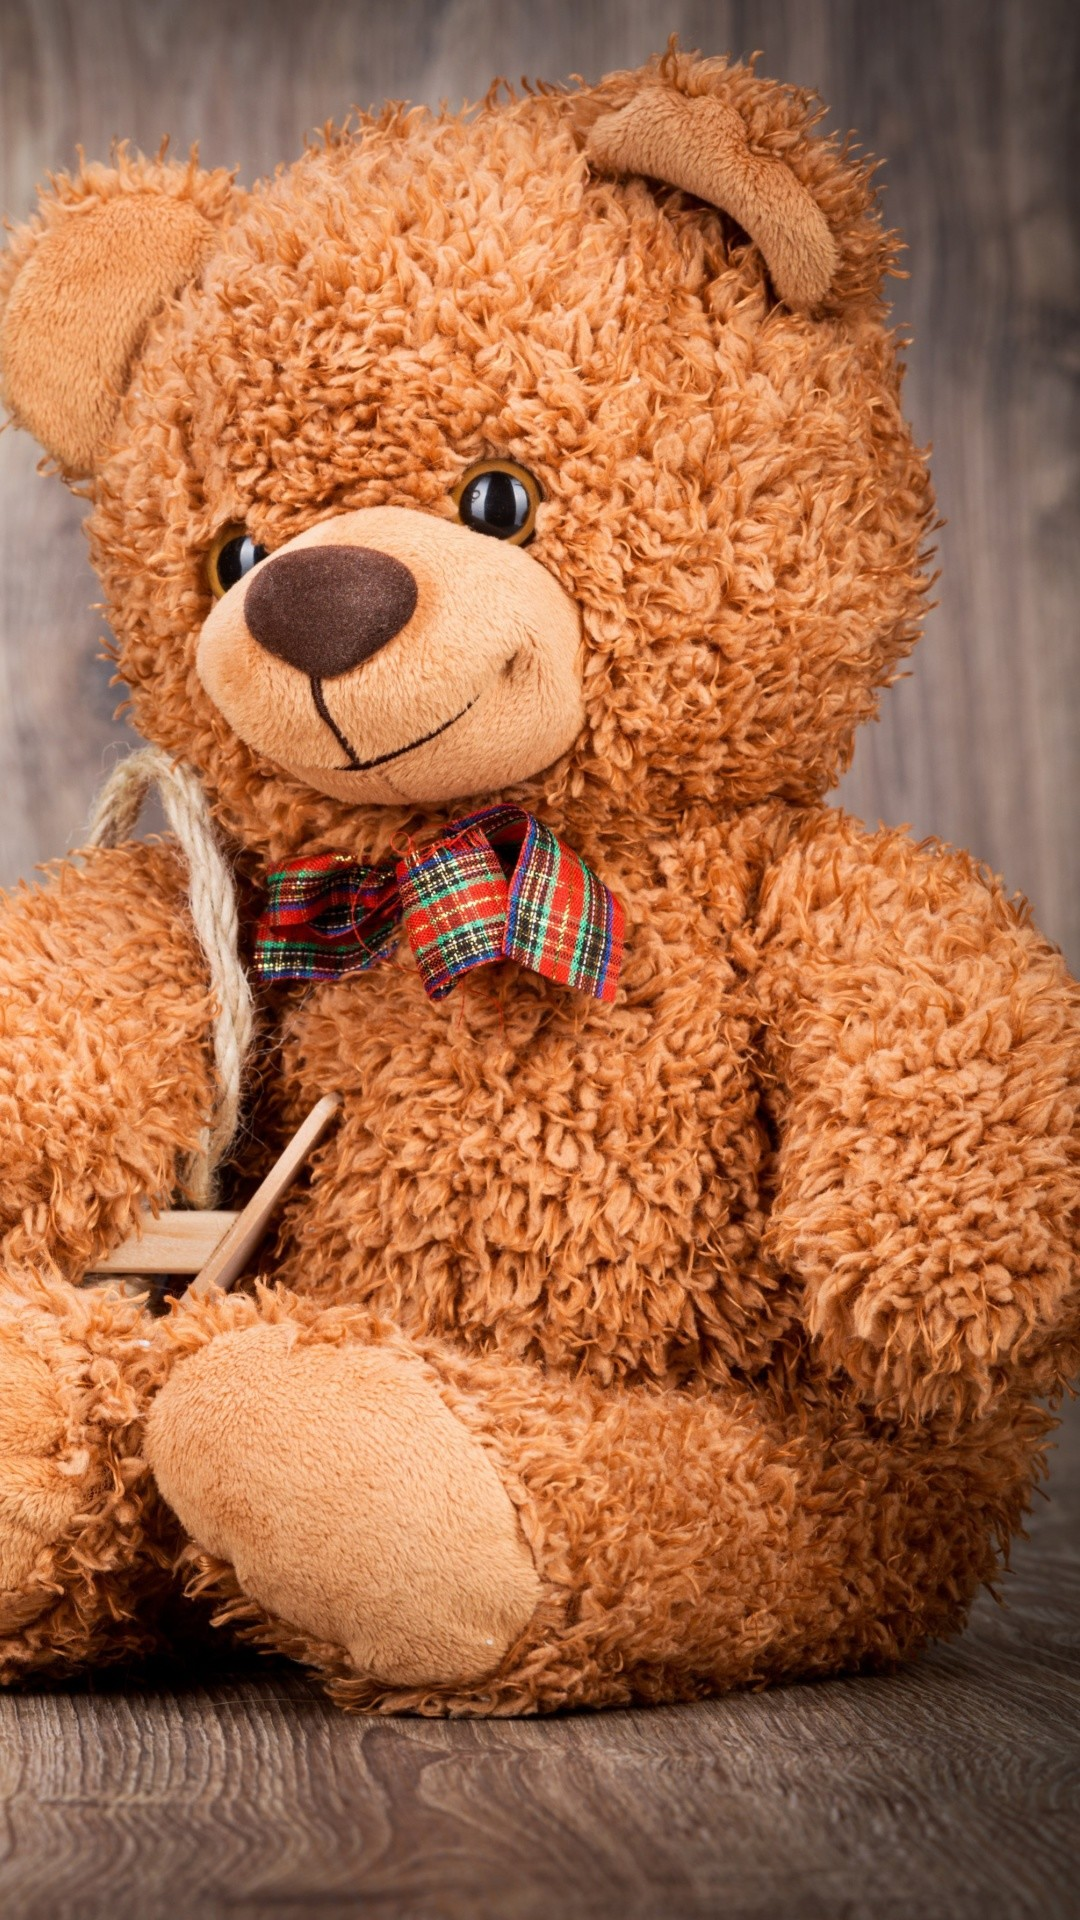 Teddy Bear Wallpapers ·①